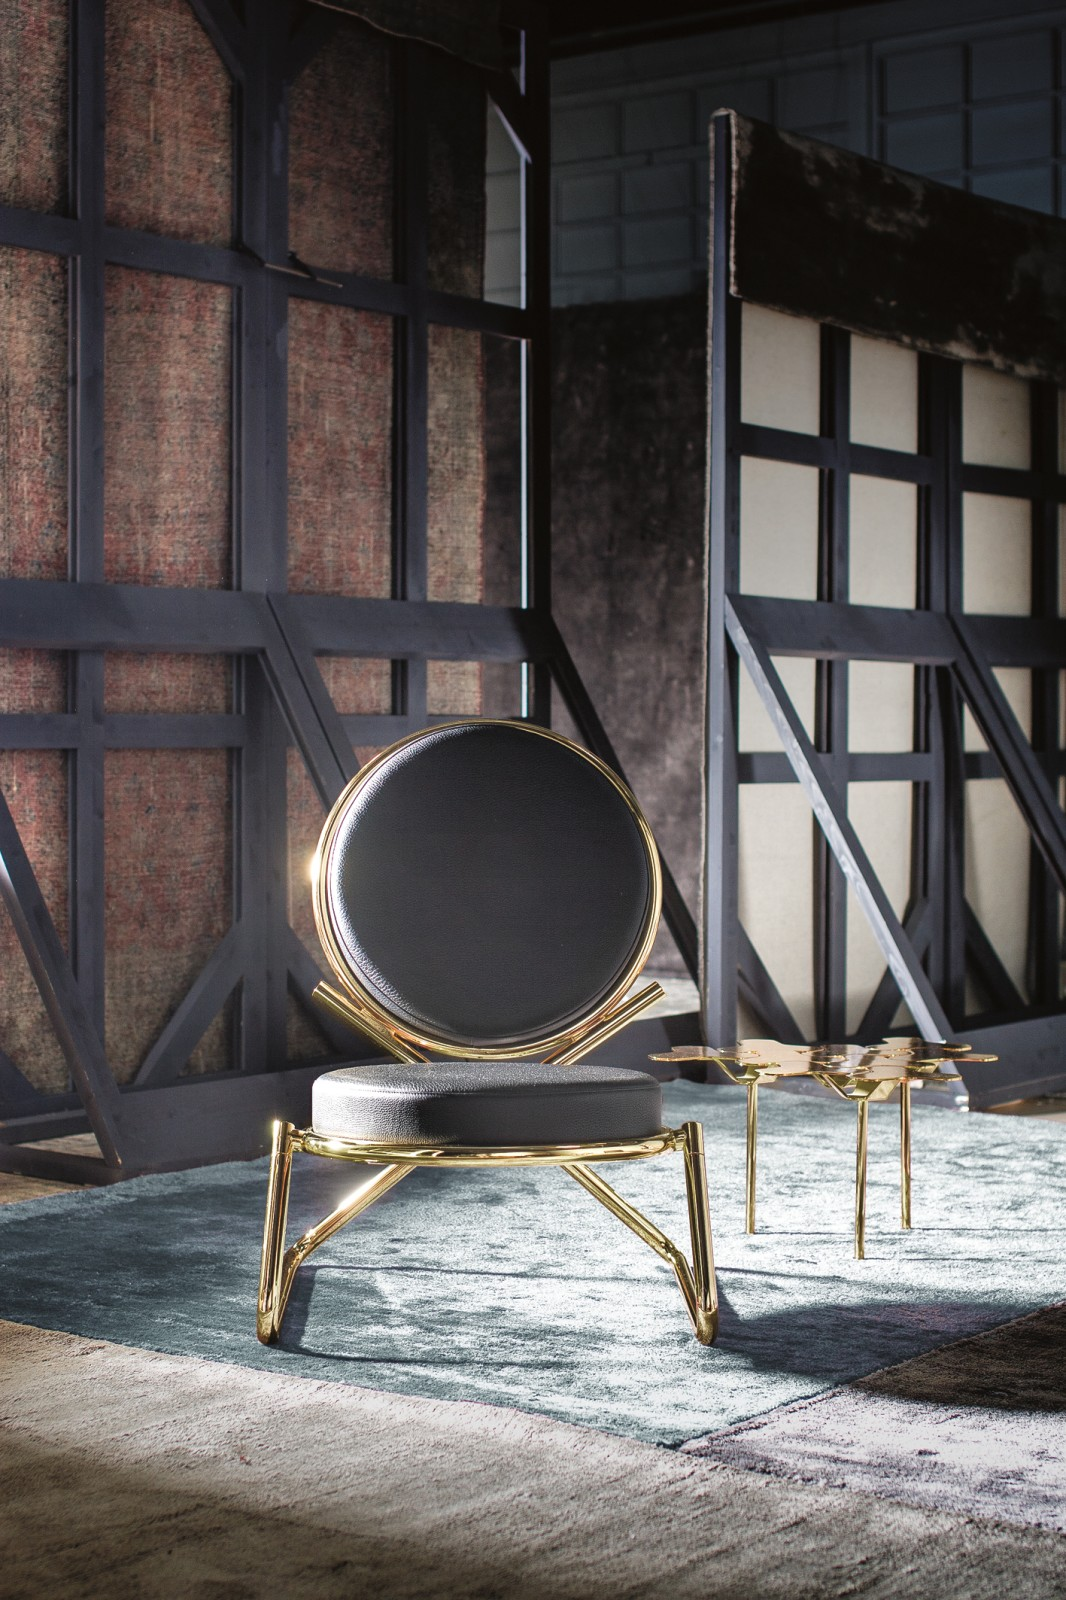 Double Zero Armchair A4500 - Art.48045 - 206 beige, Shiny Black